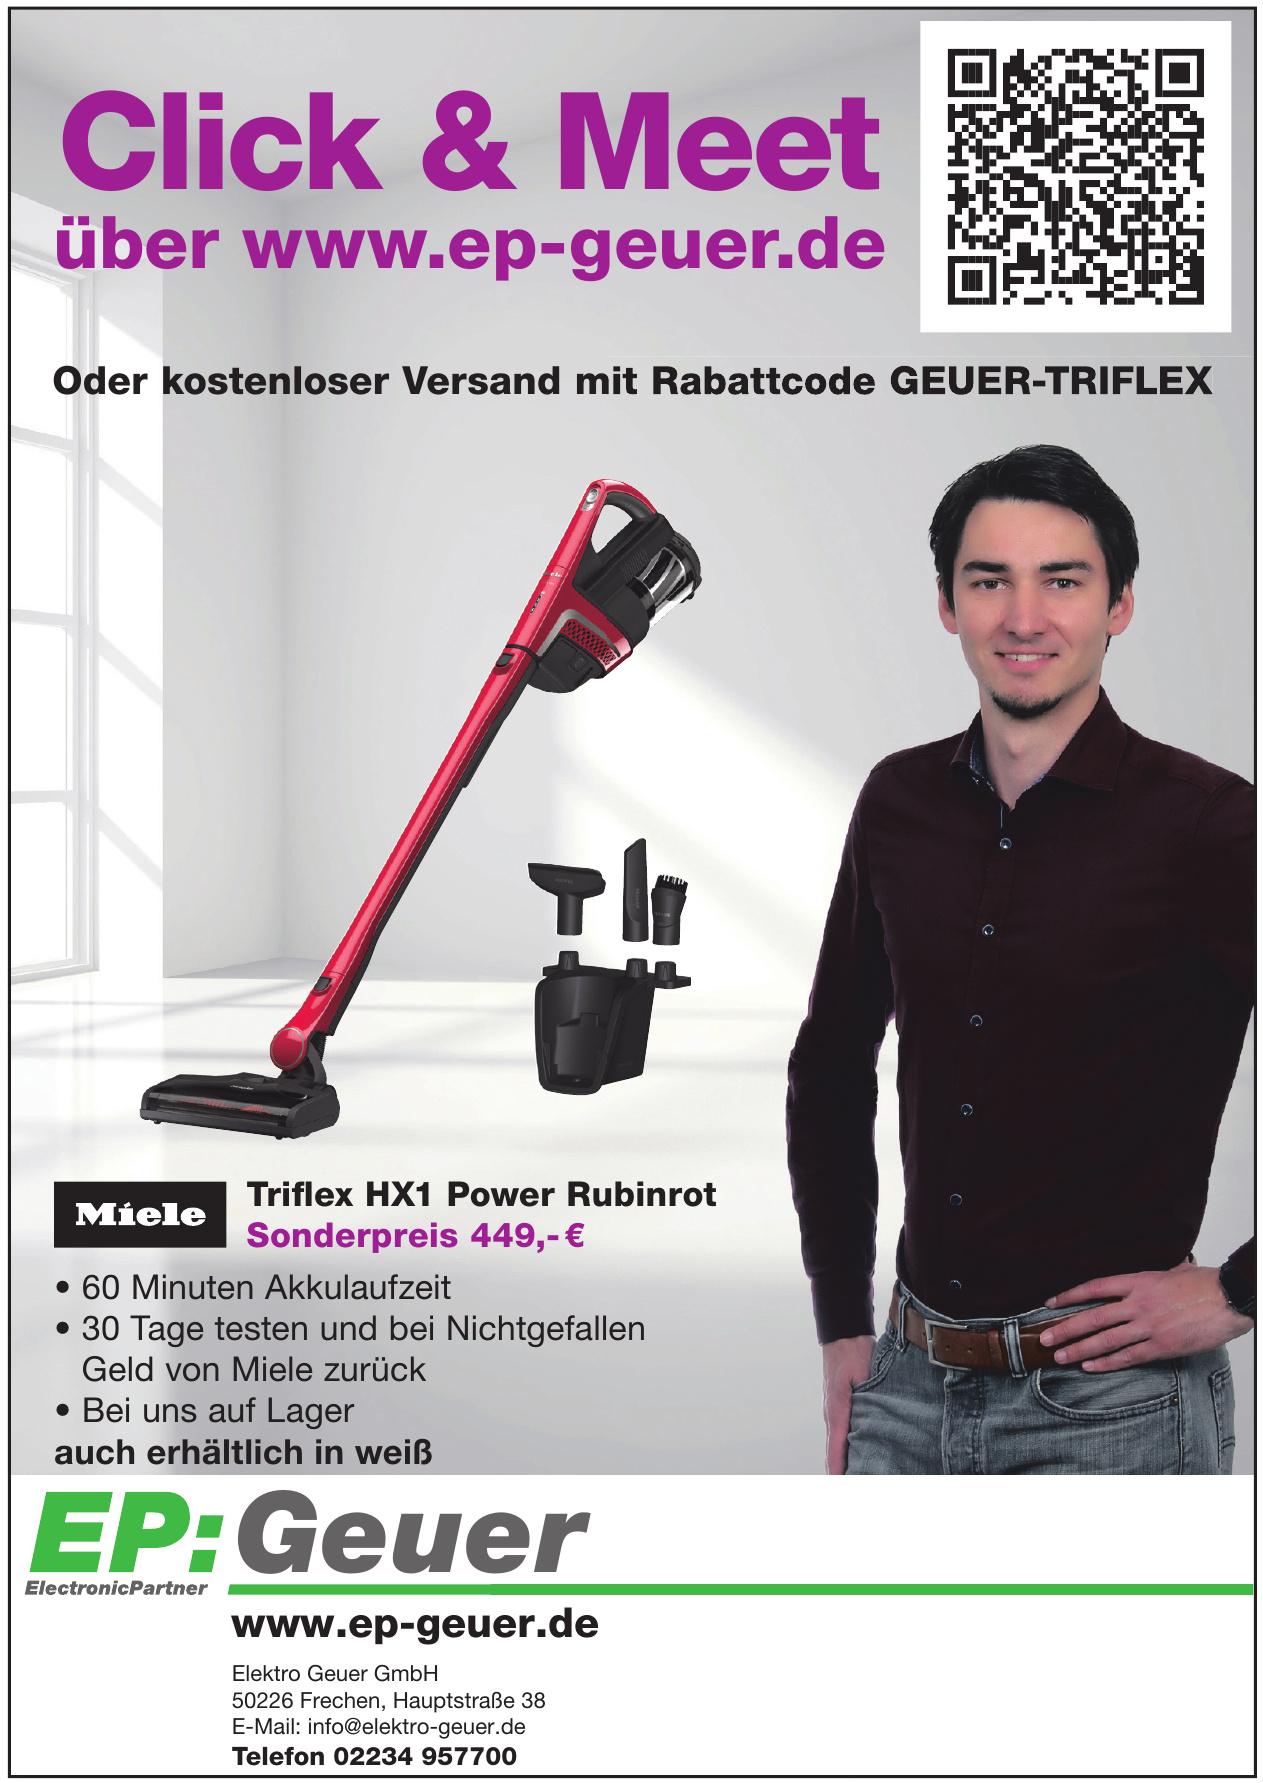 Elektro Geuer GmbH